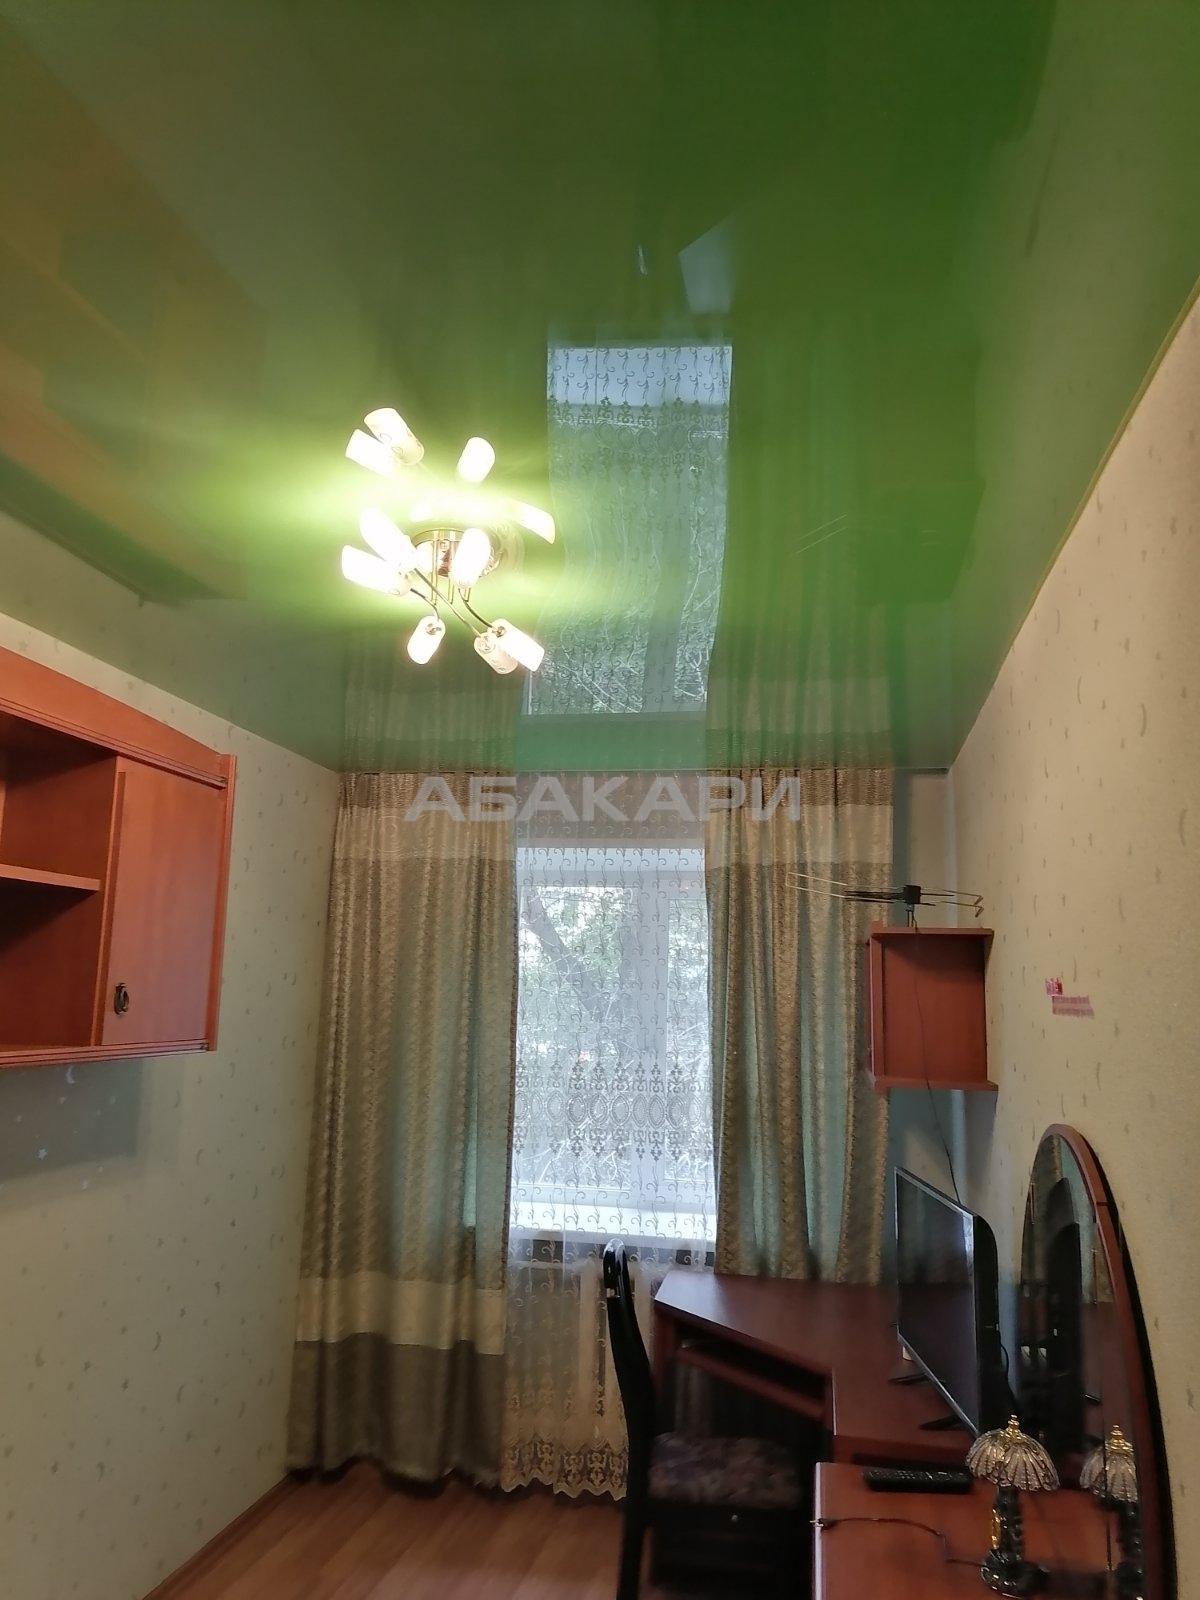 3к квартира Аэровокзальная улица, 2Б | 28000 | аренда в Красноярске фото 3